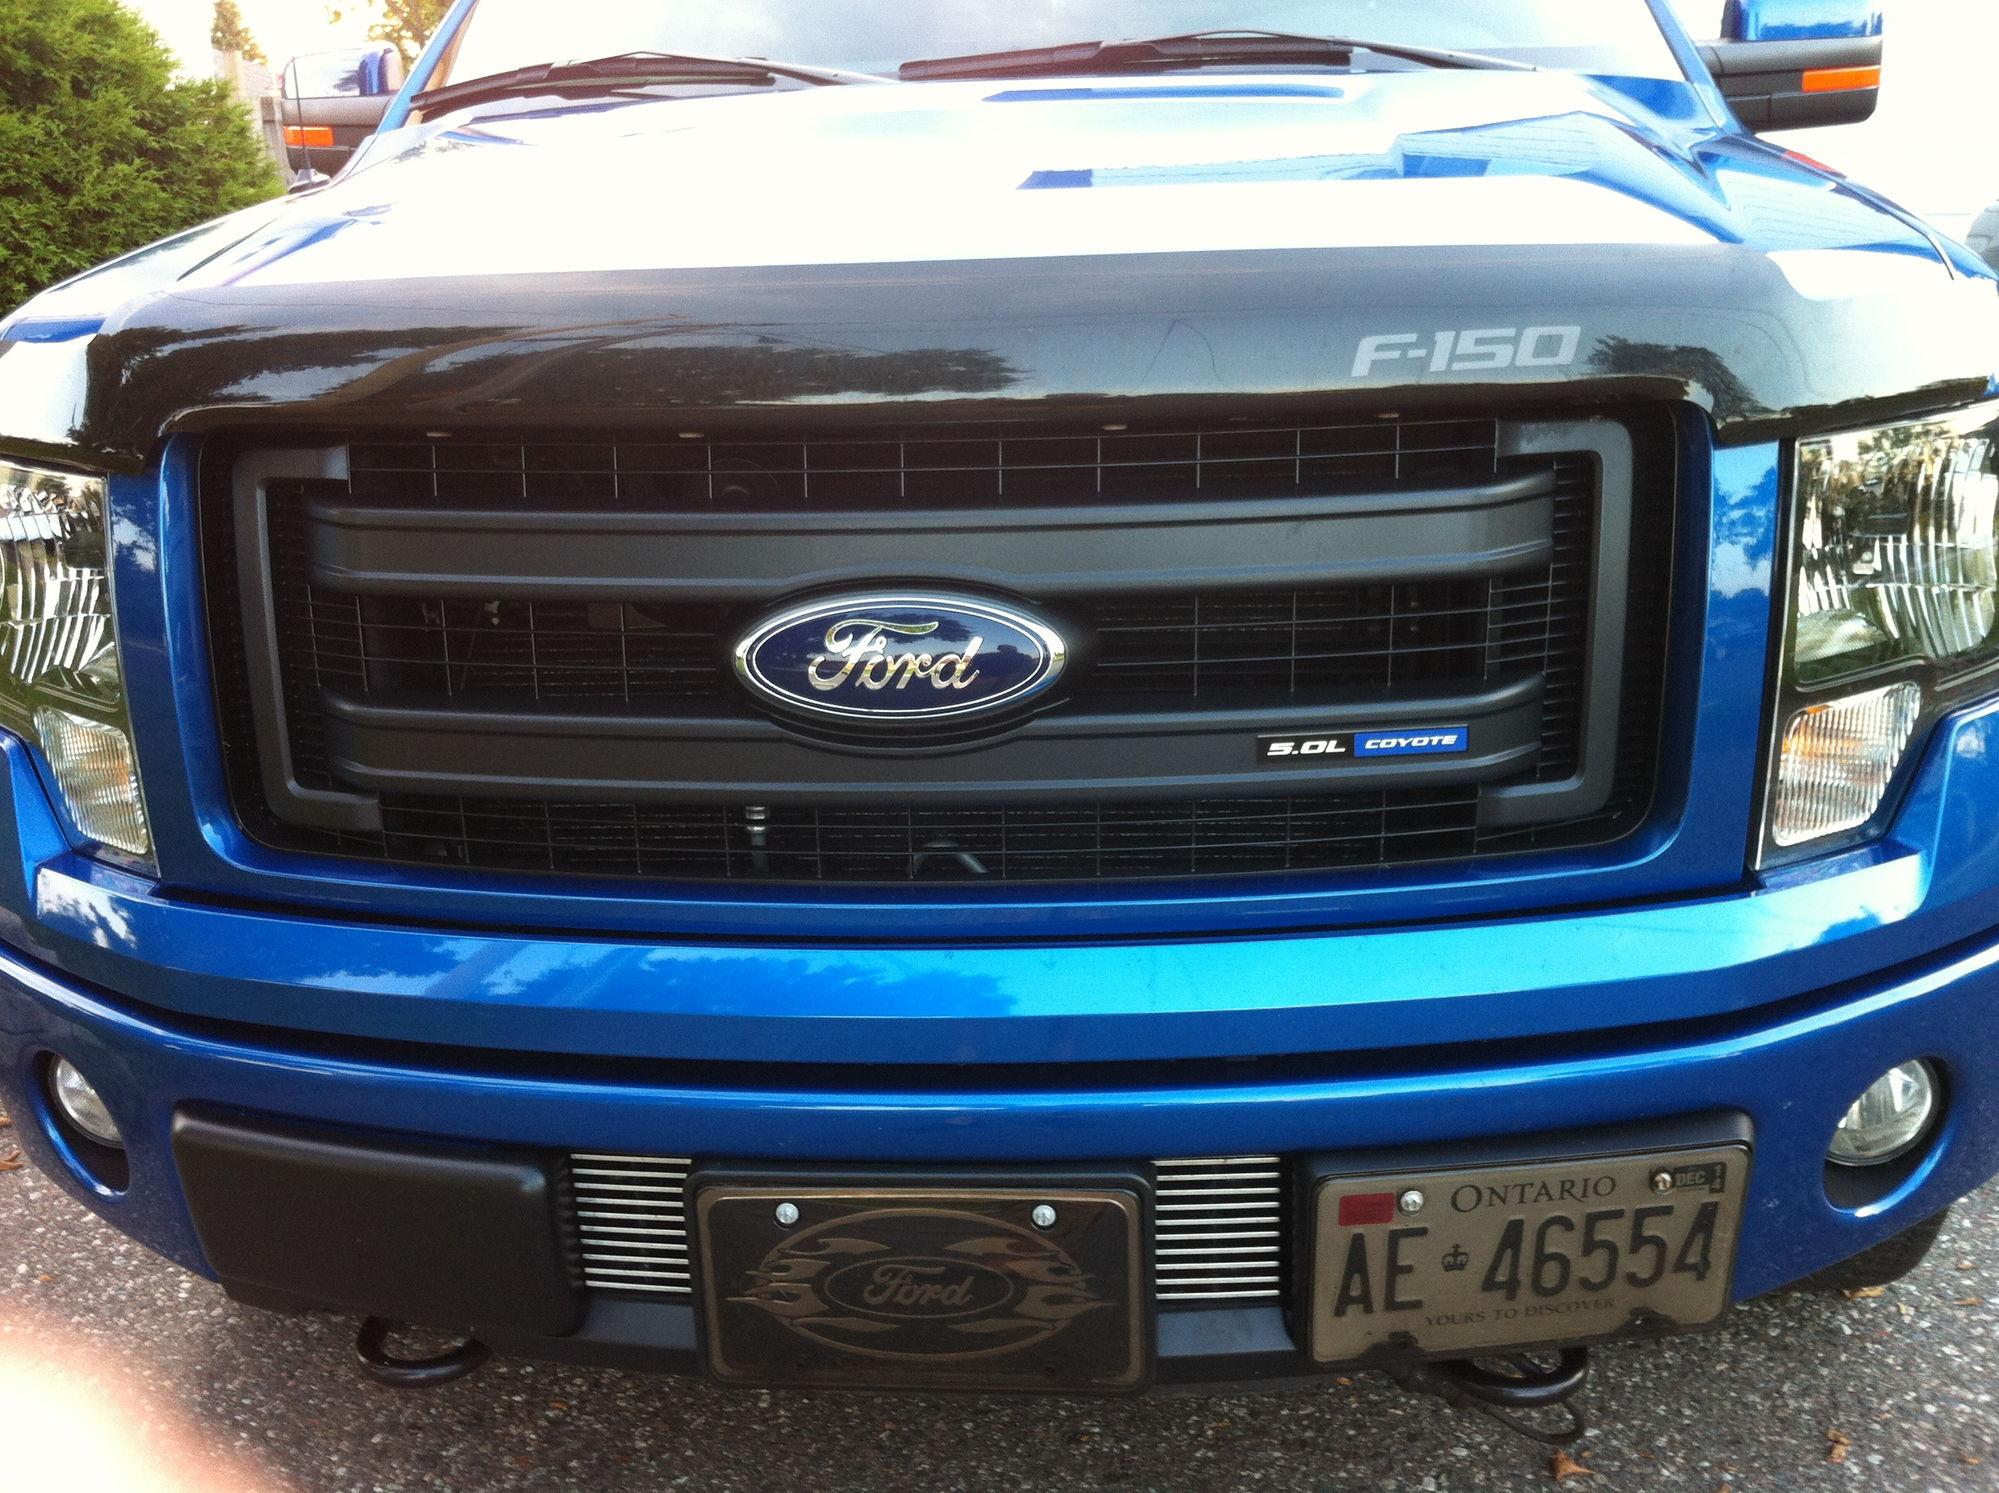 coyote badges ford f150 forum community of ford truck fans. Black Bedroom Furniture Sets. Home Design Ideas